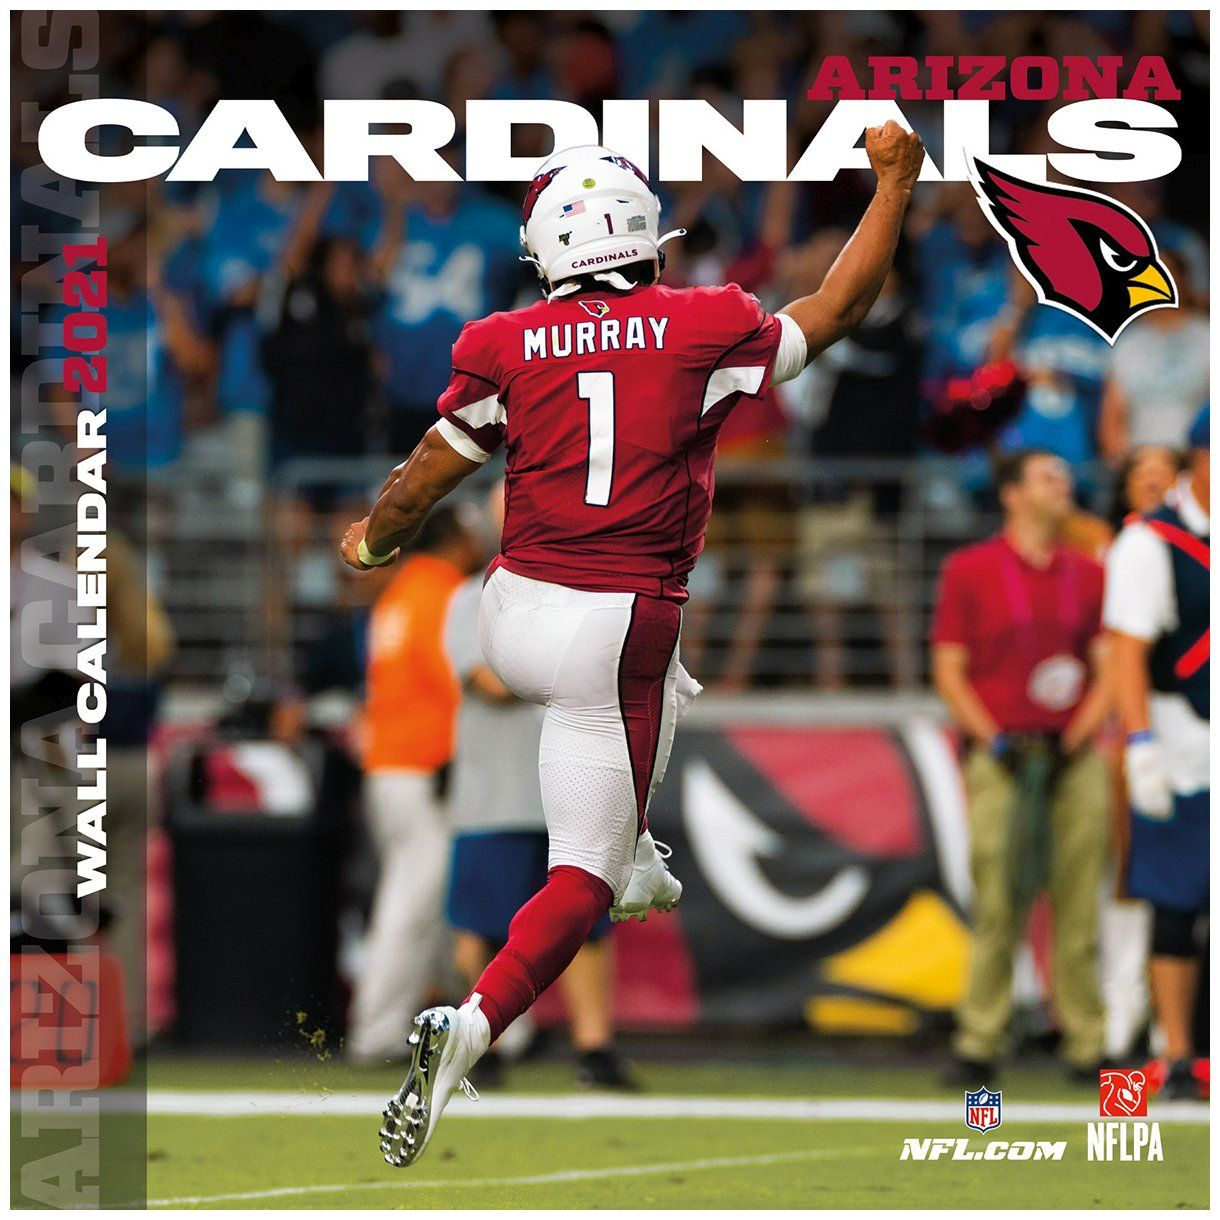 amfoo - Turner NFL 30x30cm Wand-Kalender 2021 Arizona Cardinals